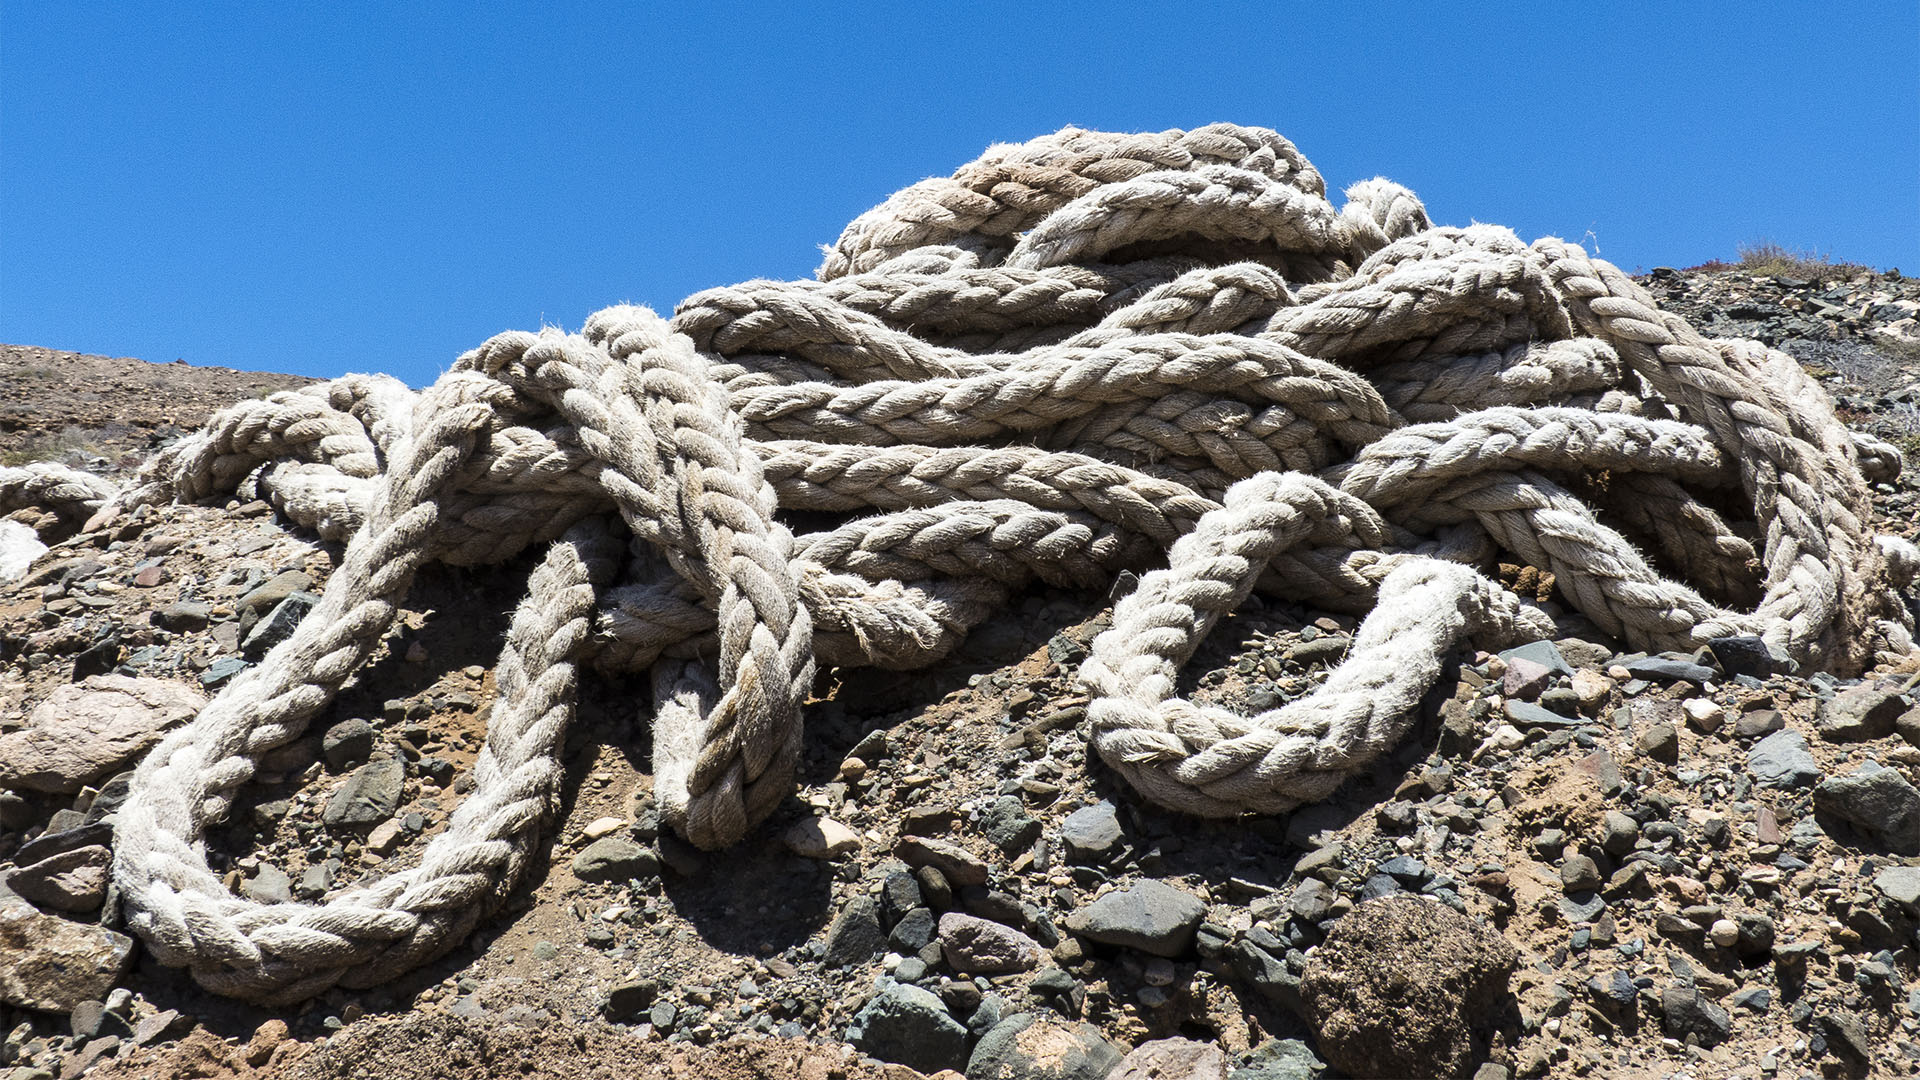 Die Strände Fuerteventuras: Playa Valle de Santa Inés